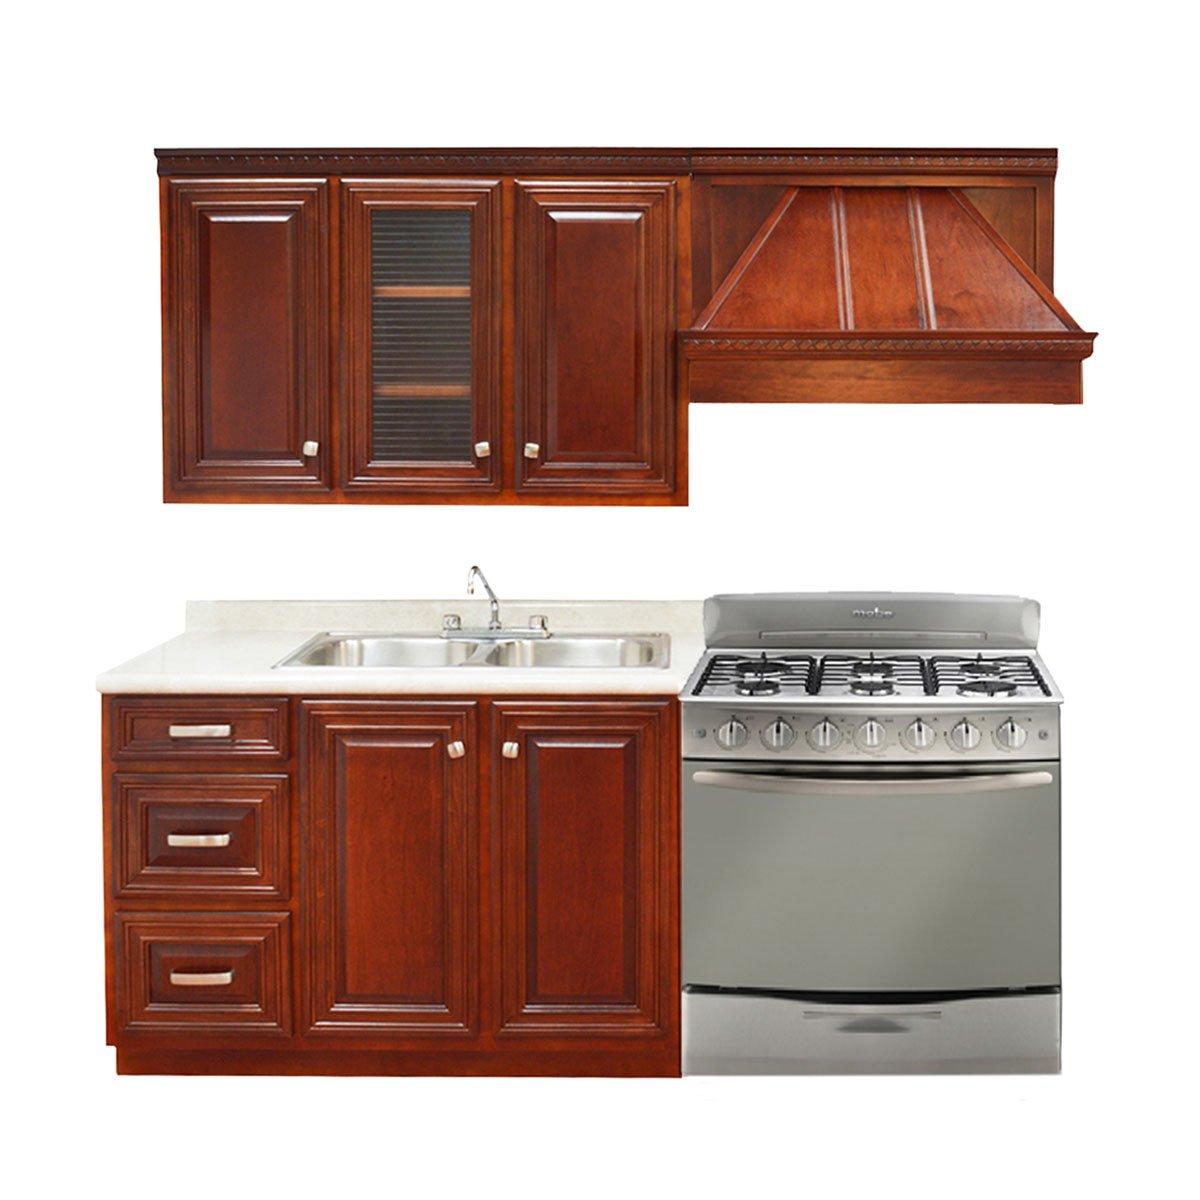 Muebles cocina cadavid ourense ideas interesantes para dise ar los ltimos - Cocinas ourense ...